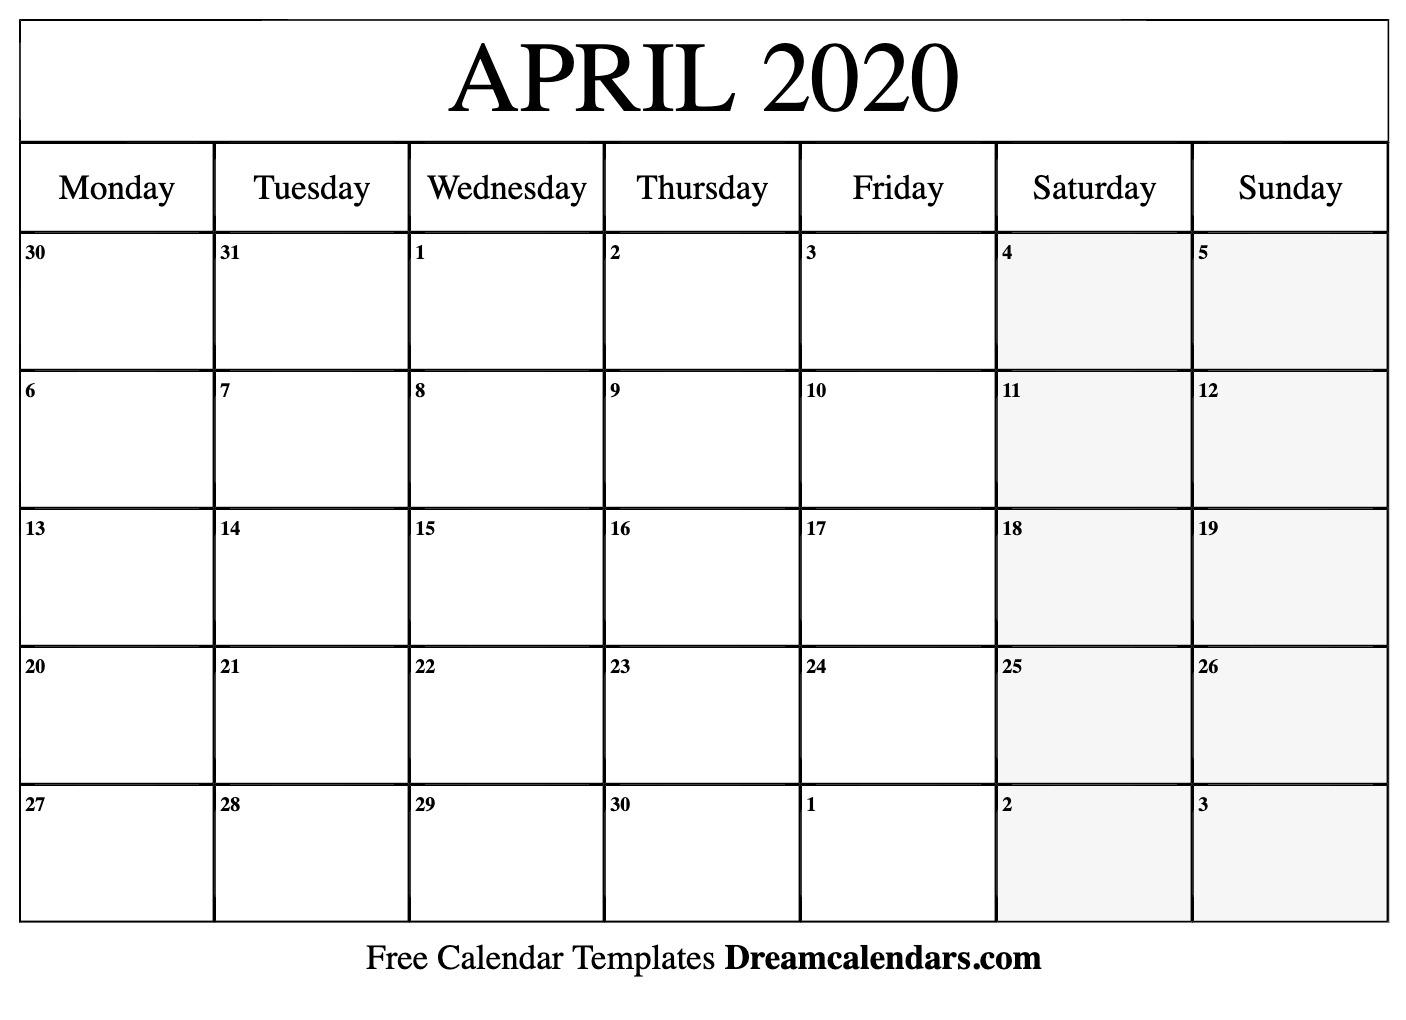 April 2020 Calendar | Free Blank Printable Templates intended for Free Printable Calendar Monday Through Friday